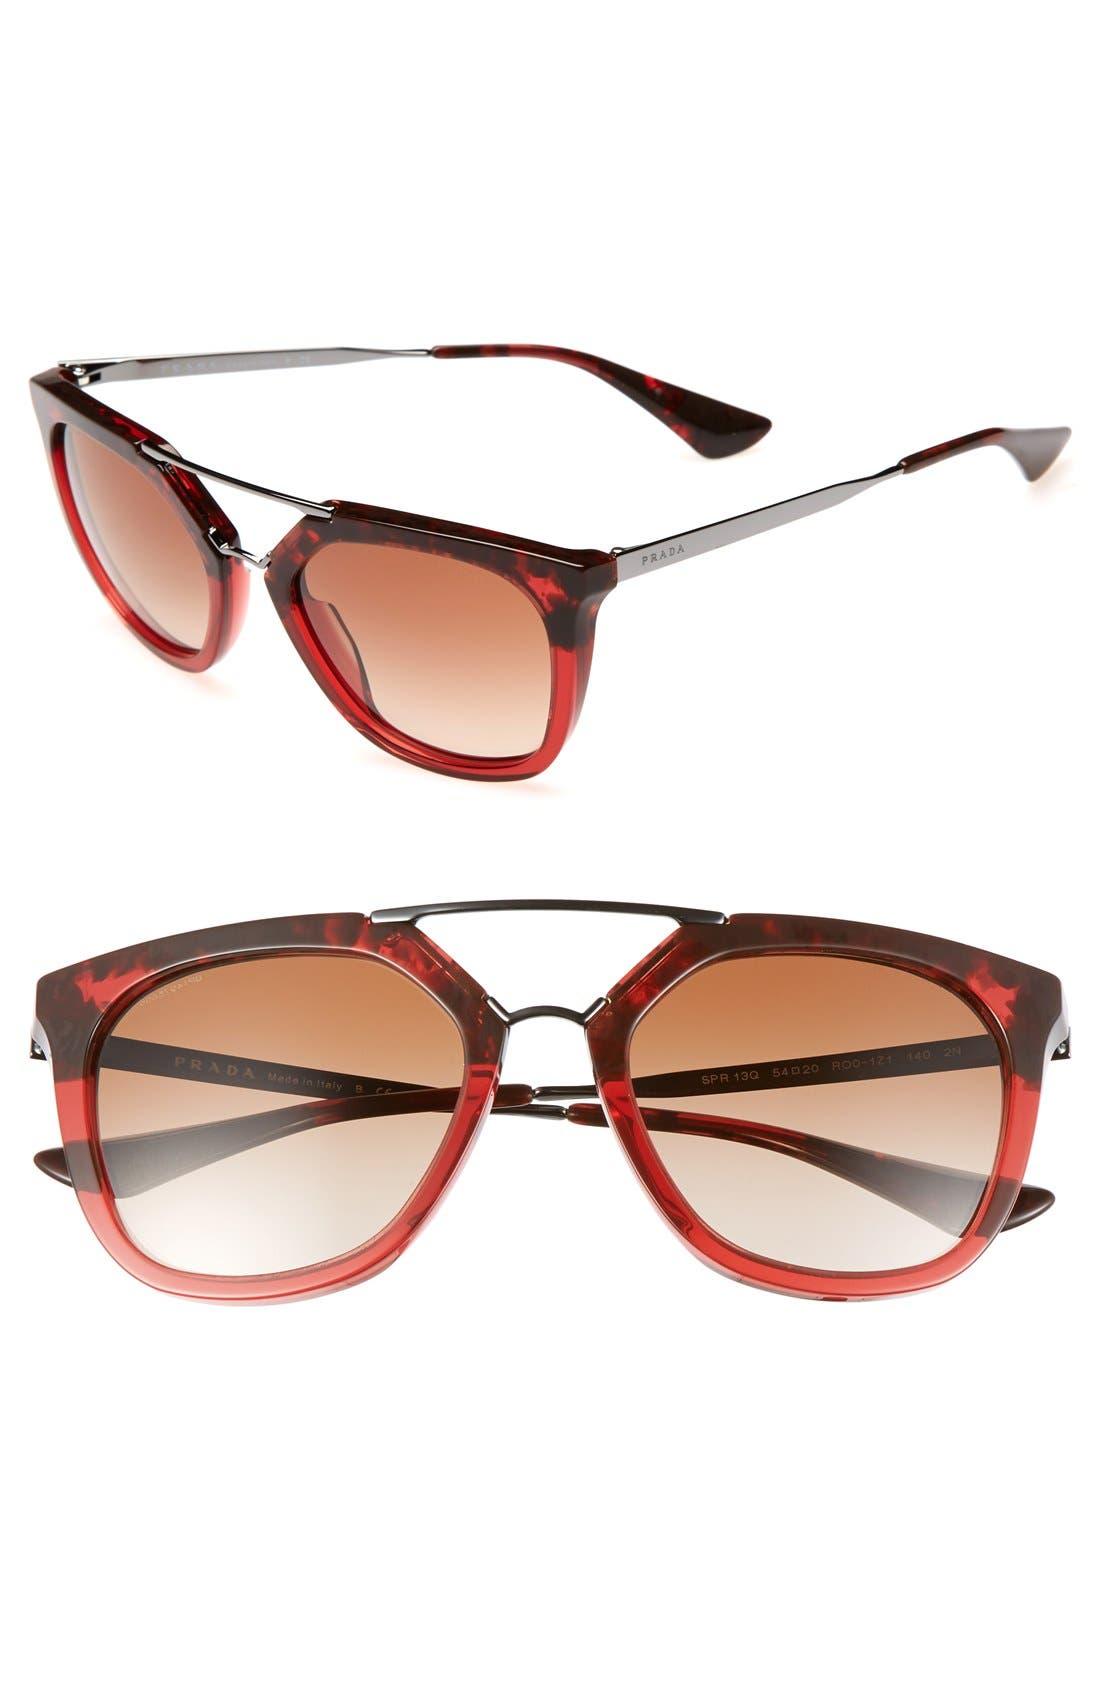 Main Image - Prada 'Pilot' 54mm Sunglasses